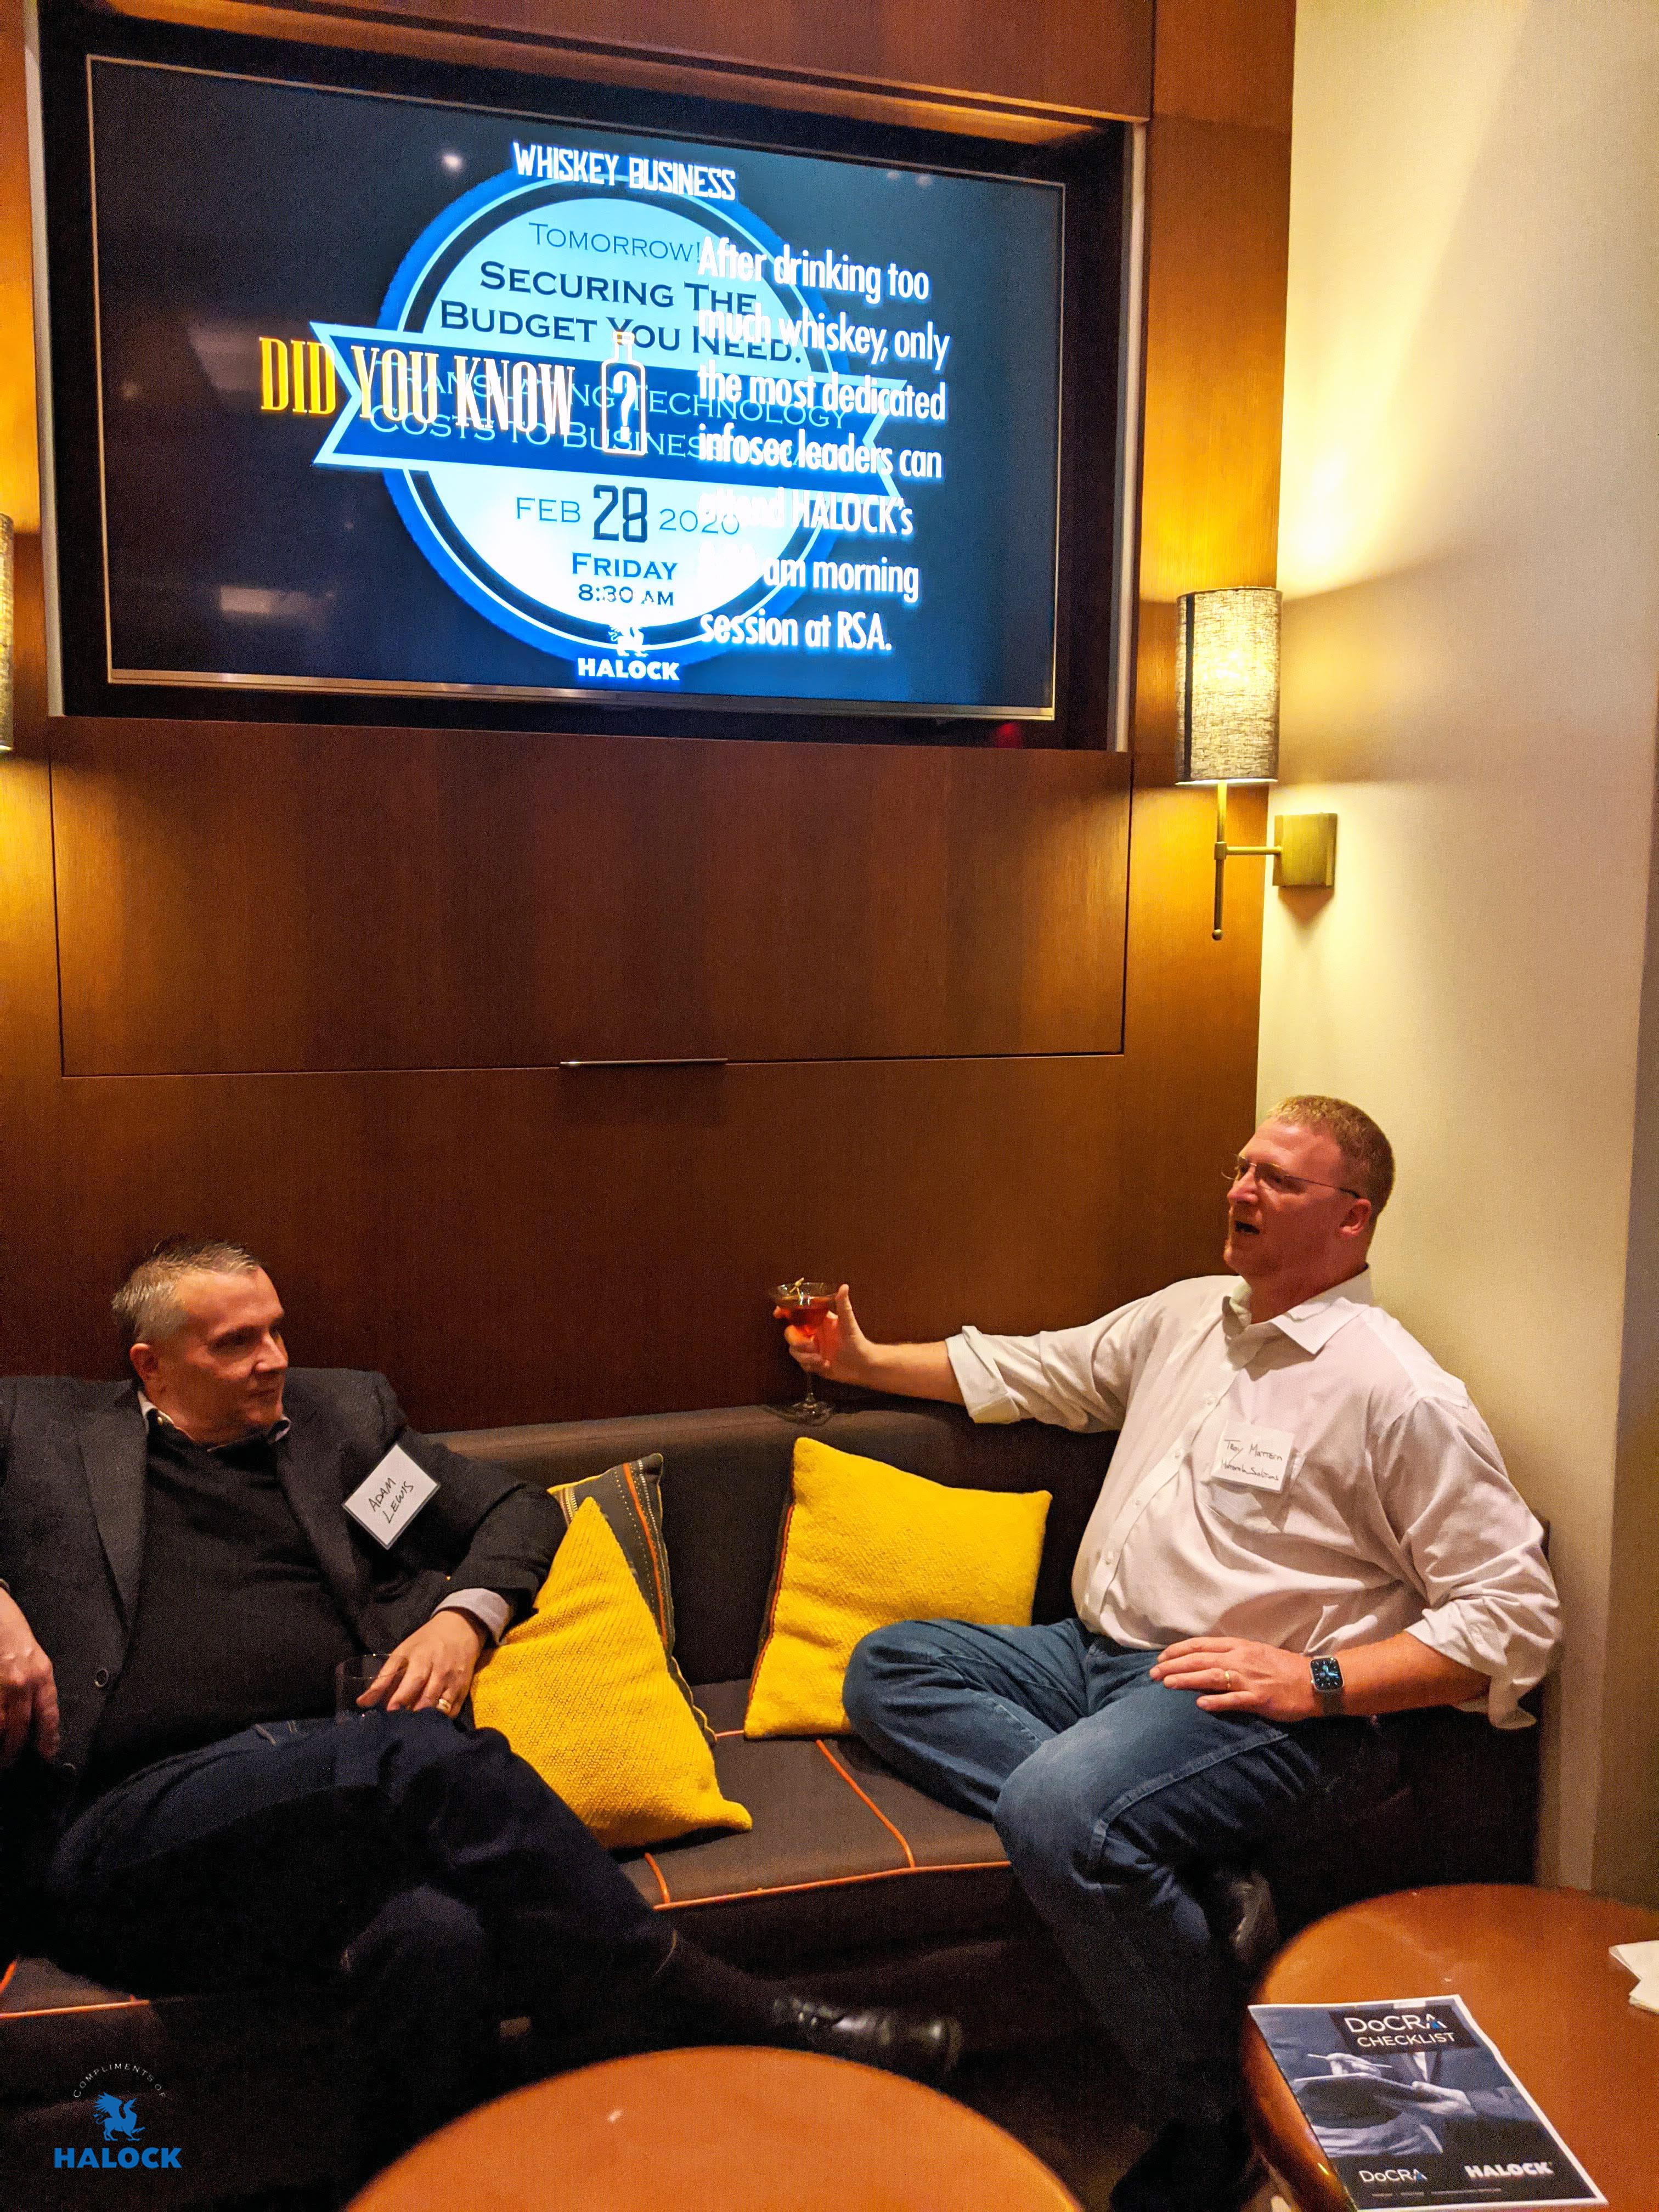 Trivia HALOCK Whiskey Business at RSA